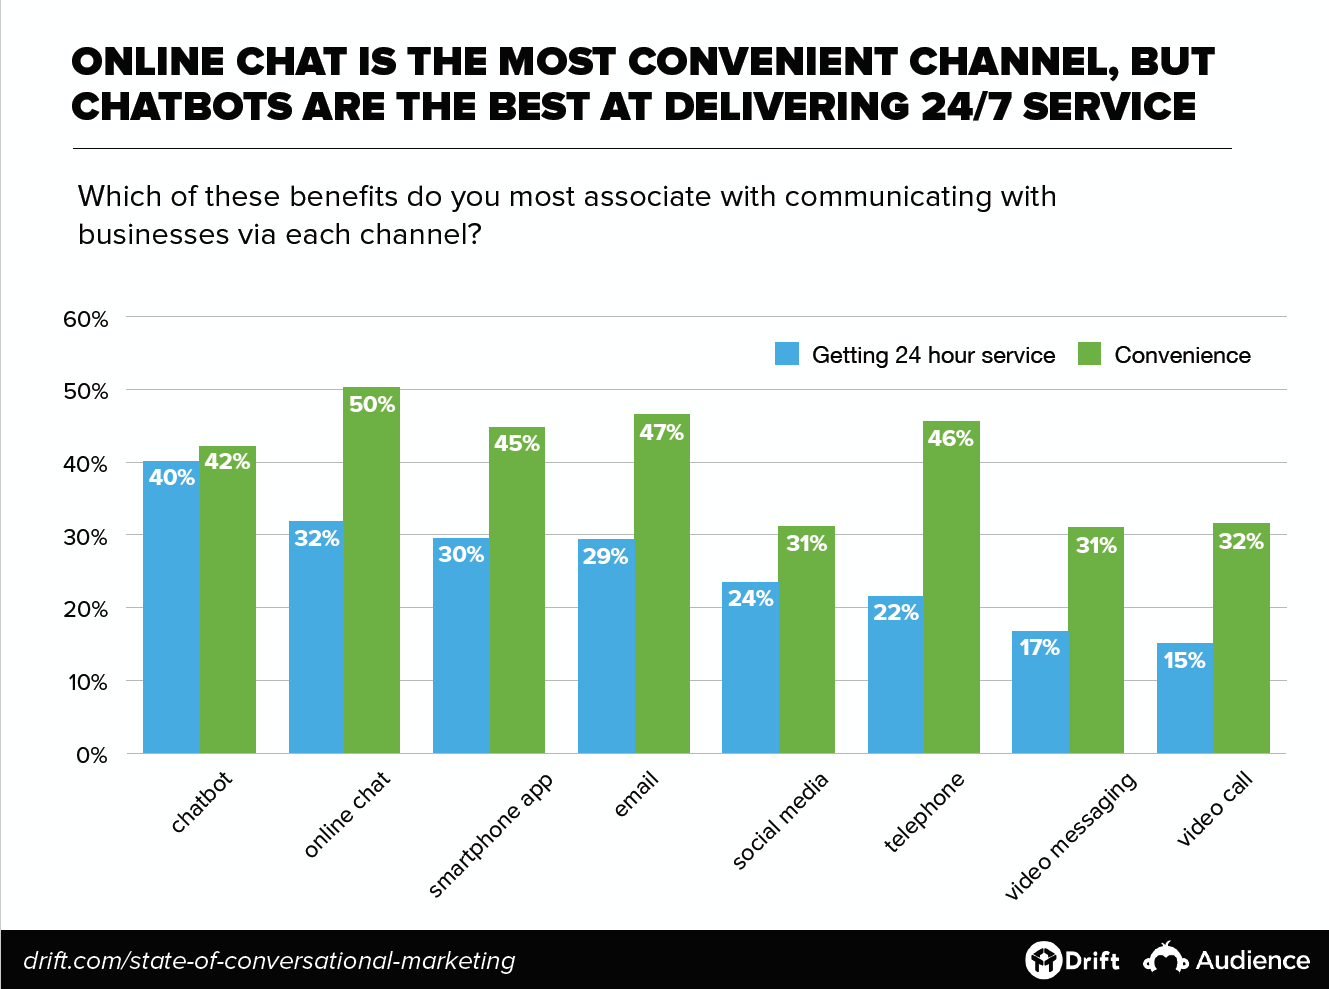 Online chat versus chatbots